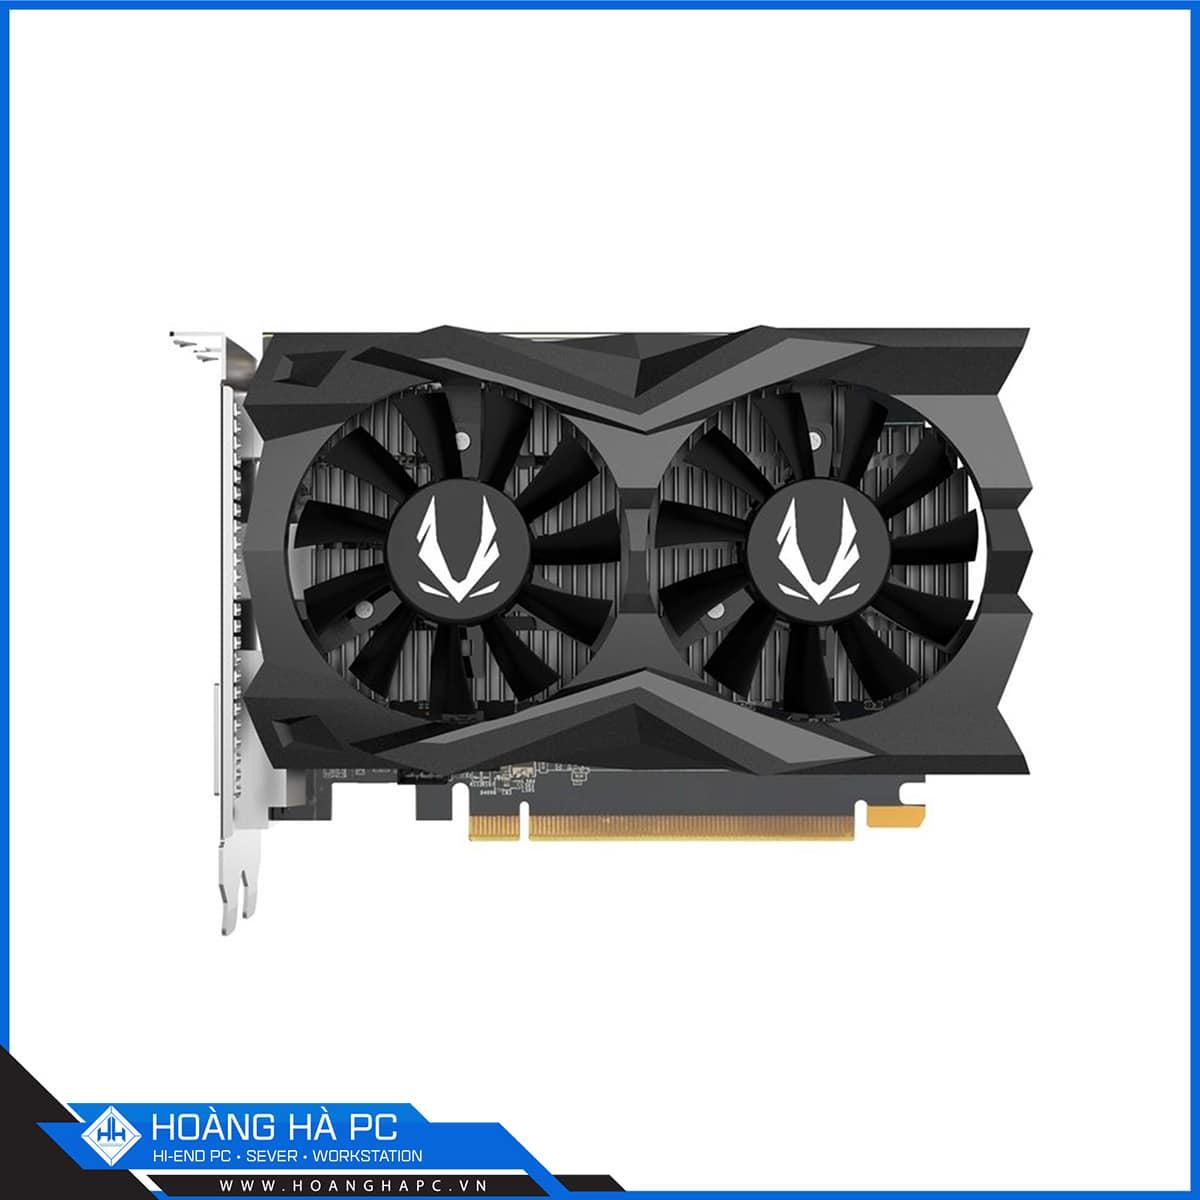 Zotac Gaming GeForce GTX 1650 AMP Core 4GB GDDR6